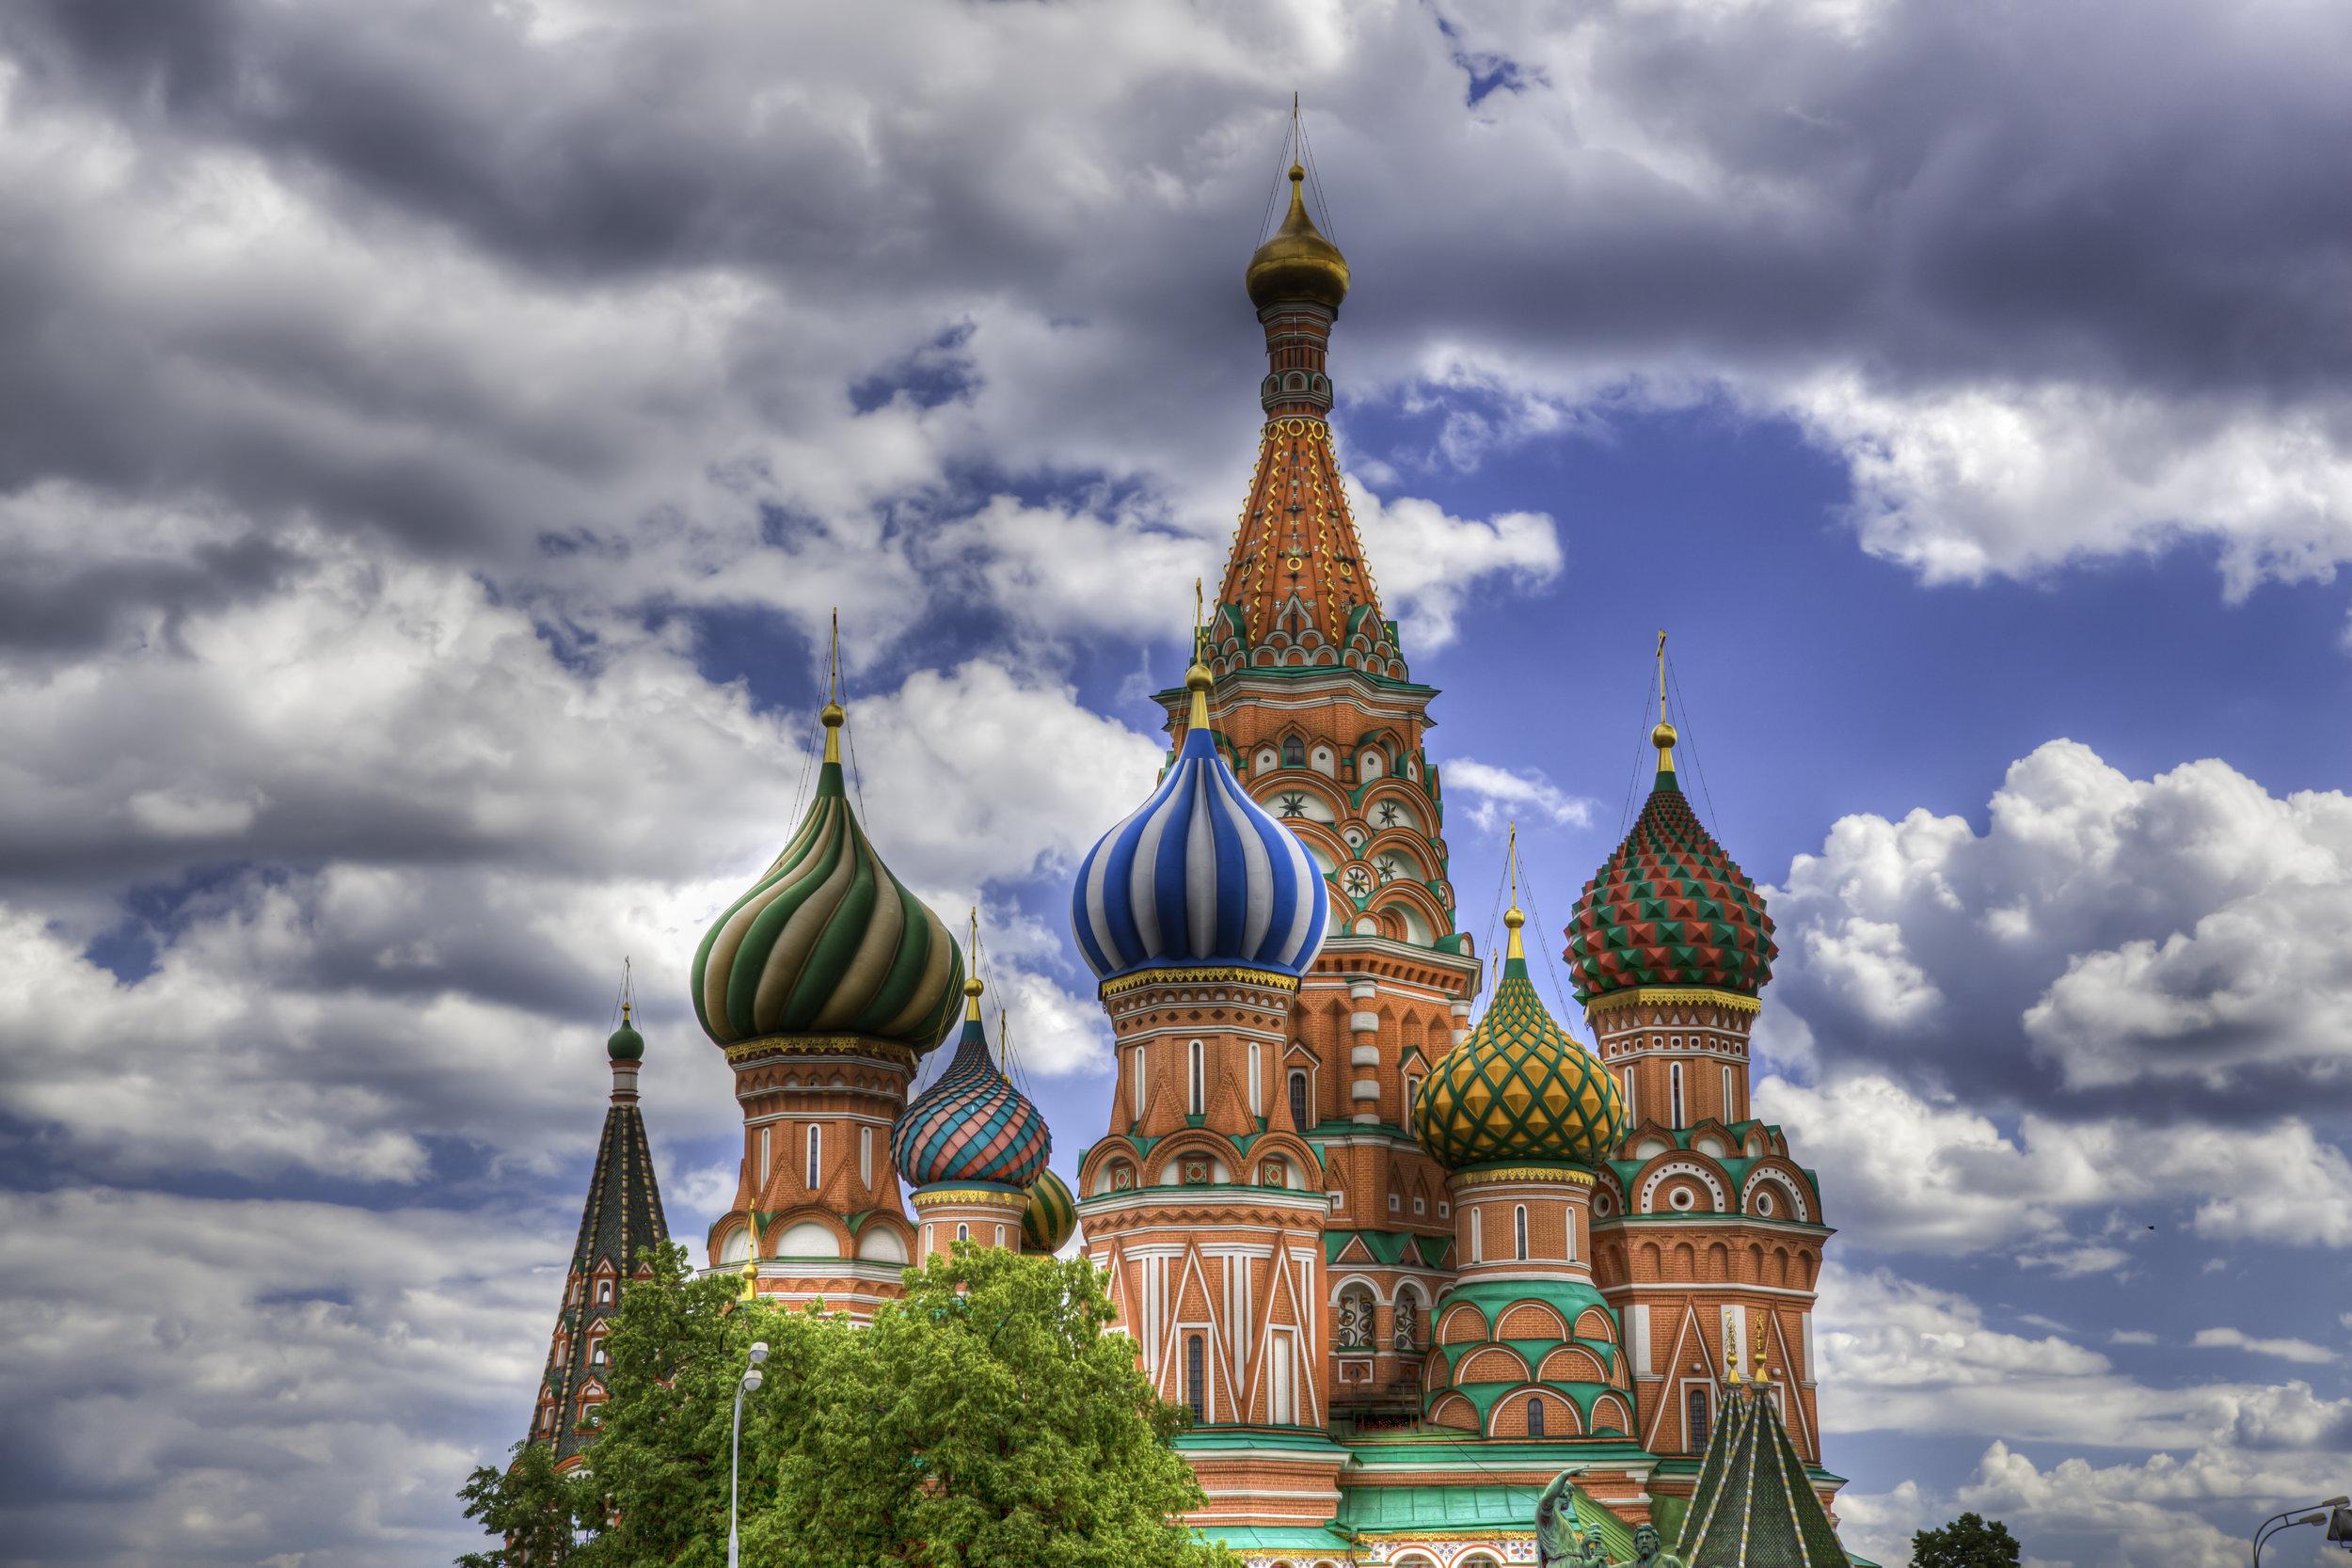 St. Basil's Cathedral – Photo by  Valerii Tkachenko via Wikimedia Commons